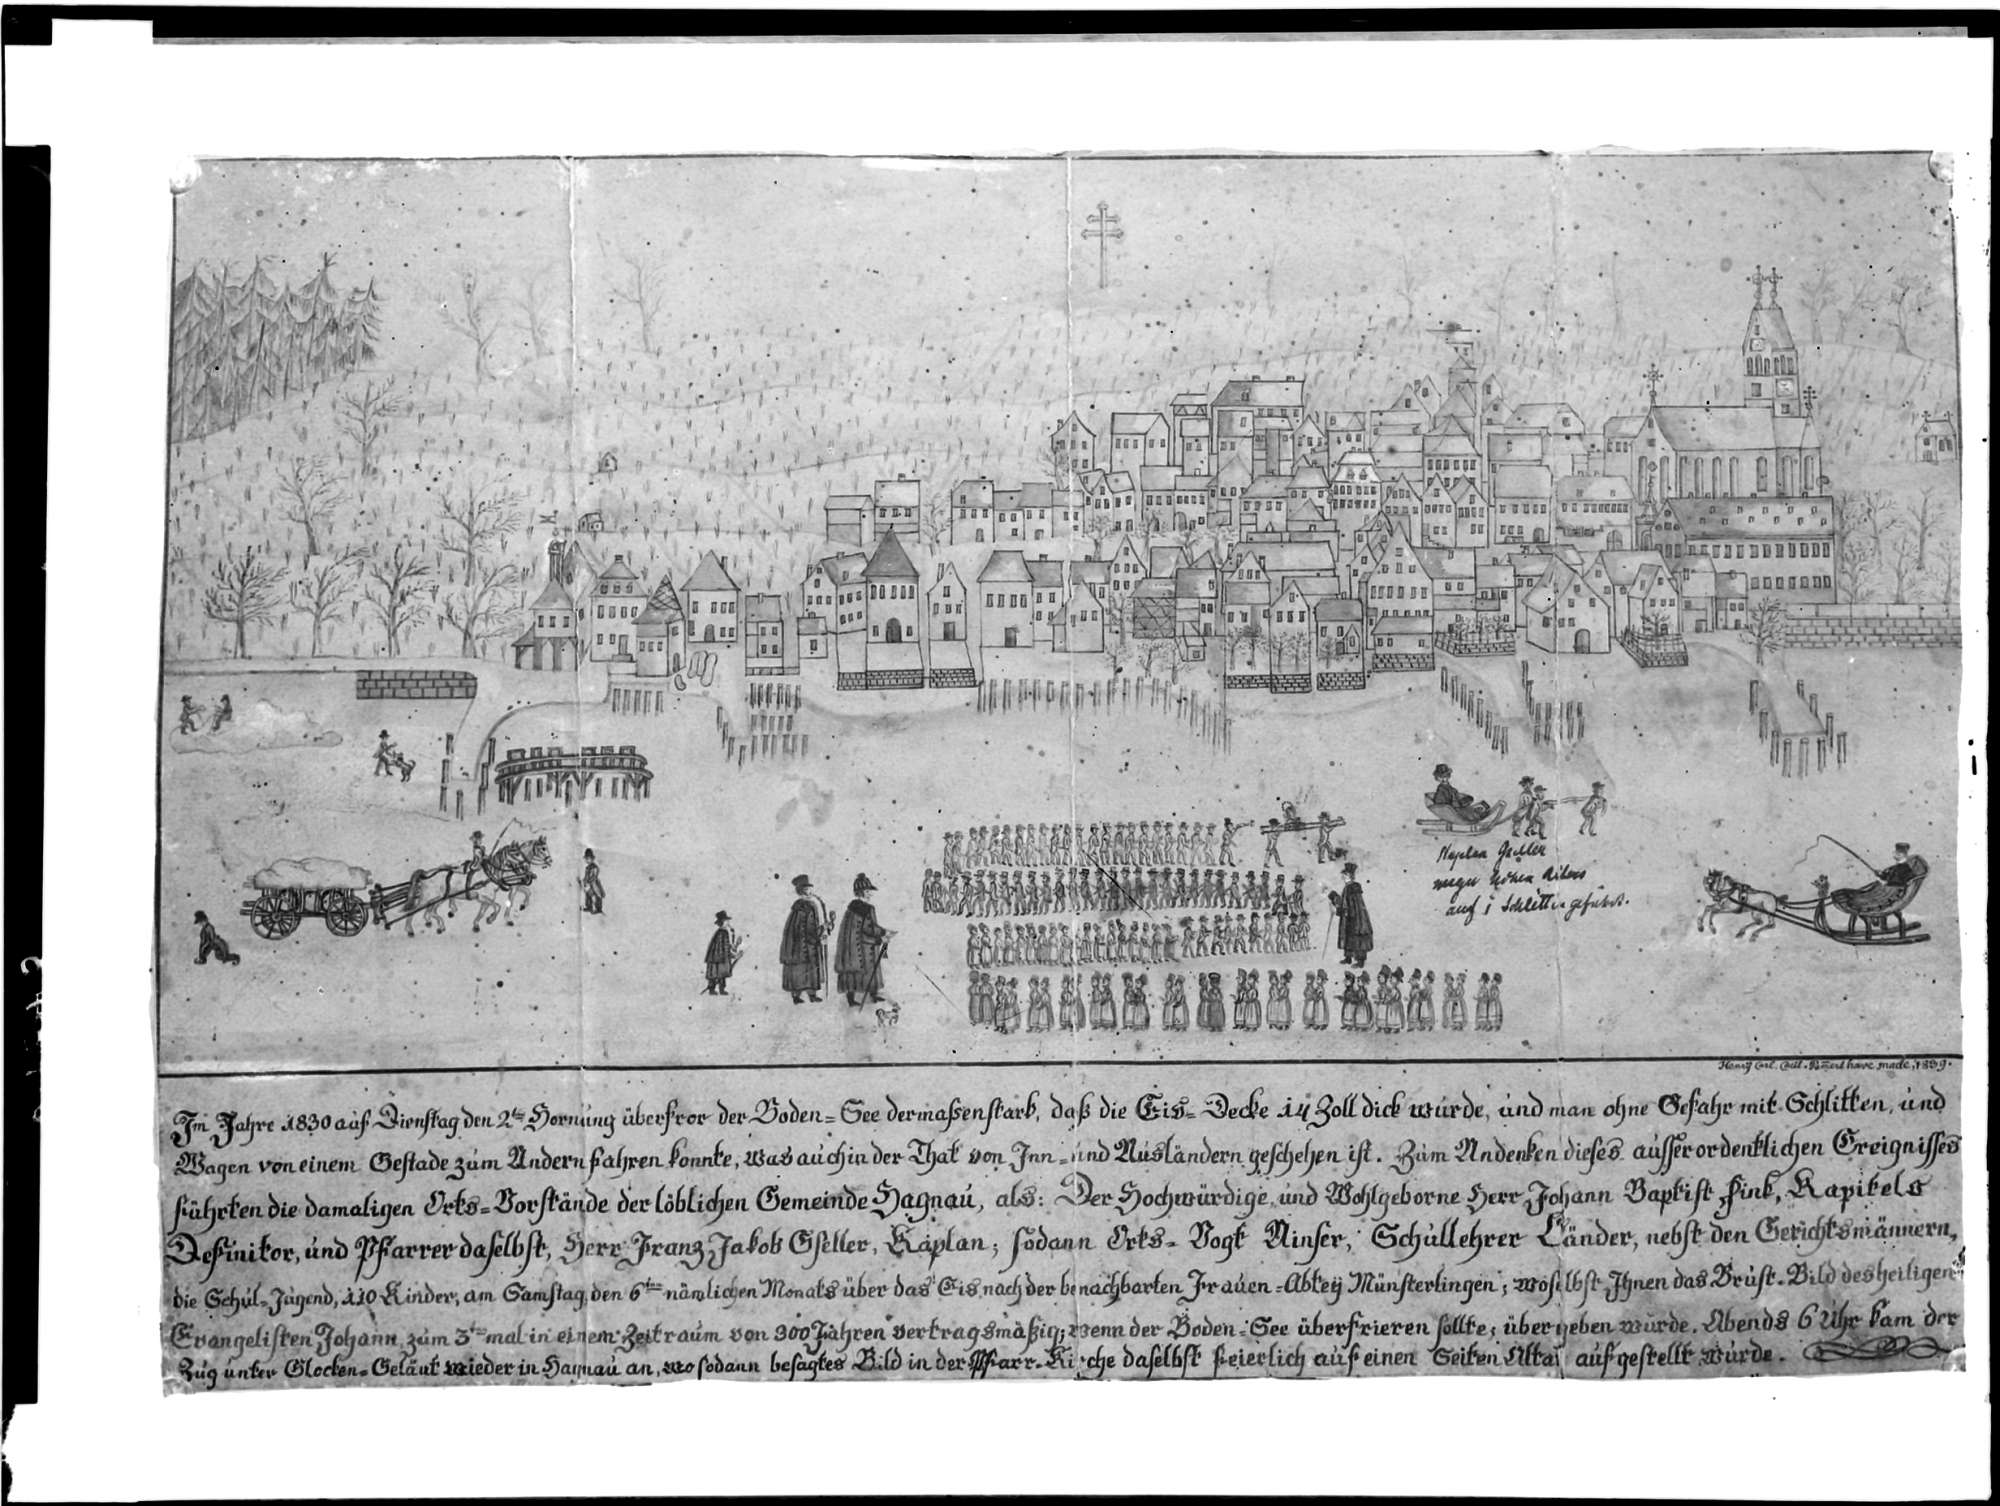 Hagnau Seeprozession 6. Februar 1830, Bild 1